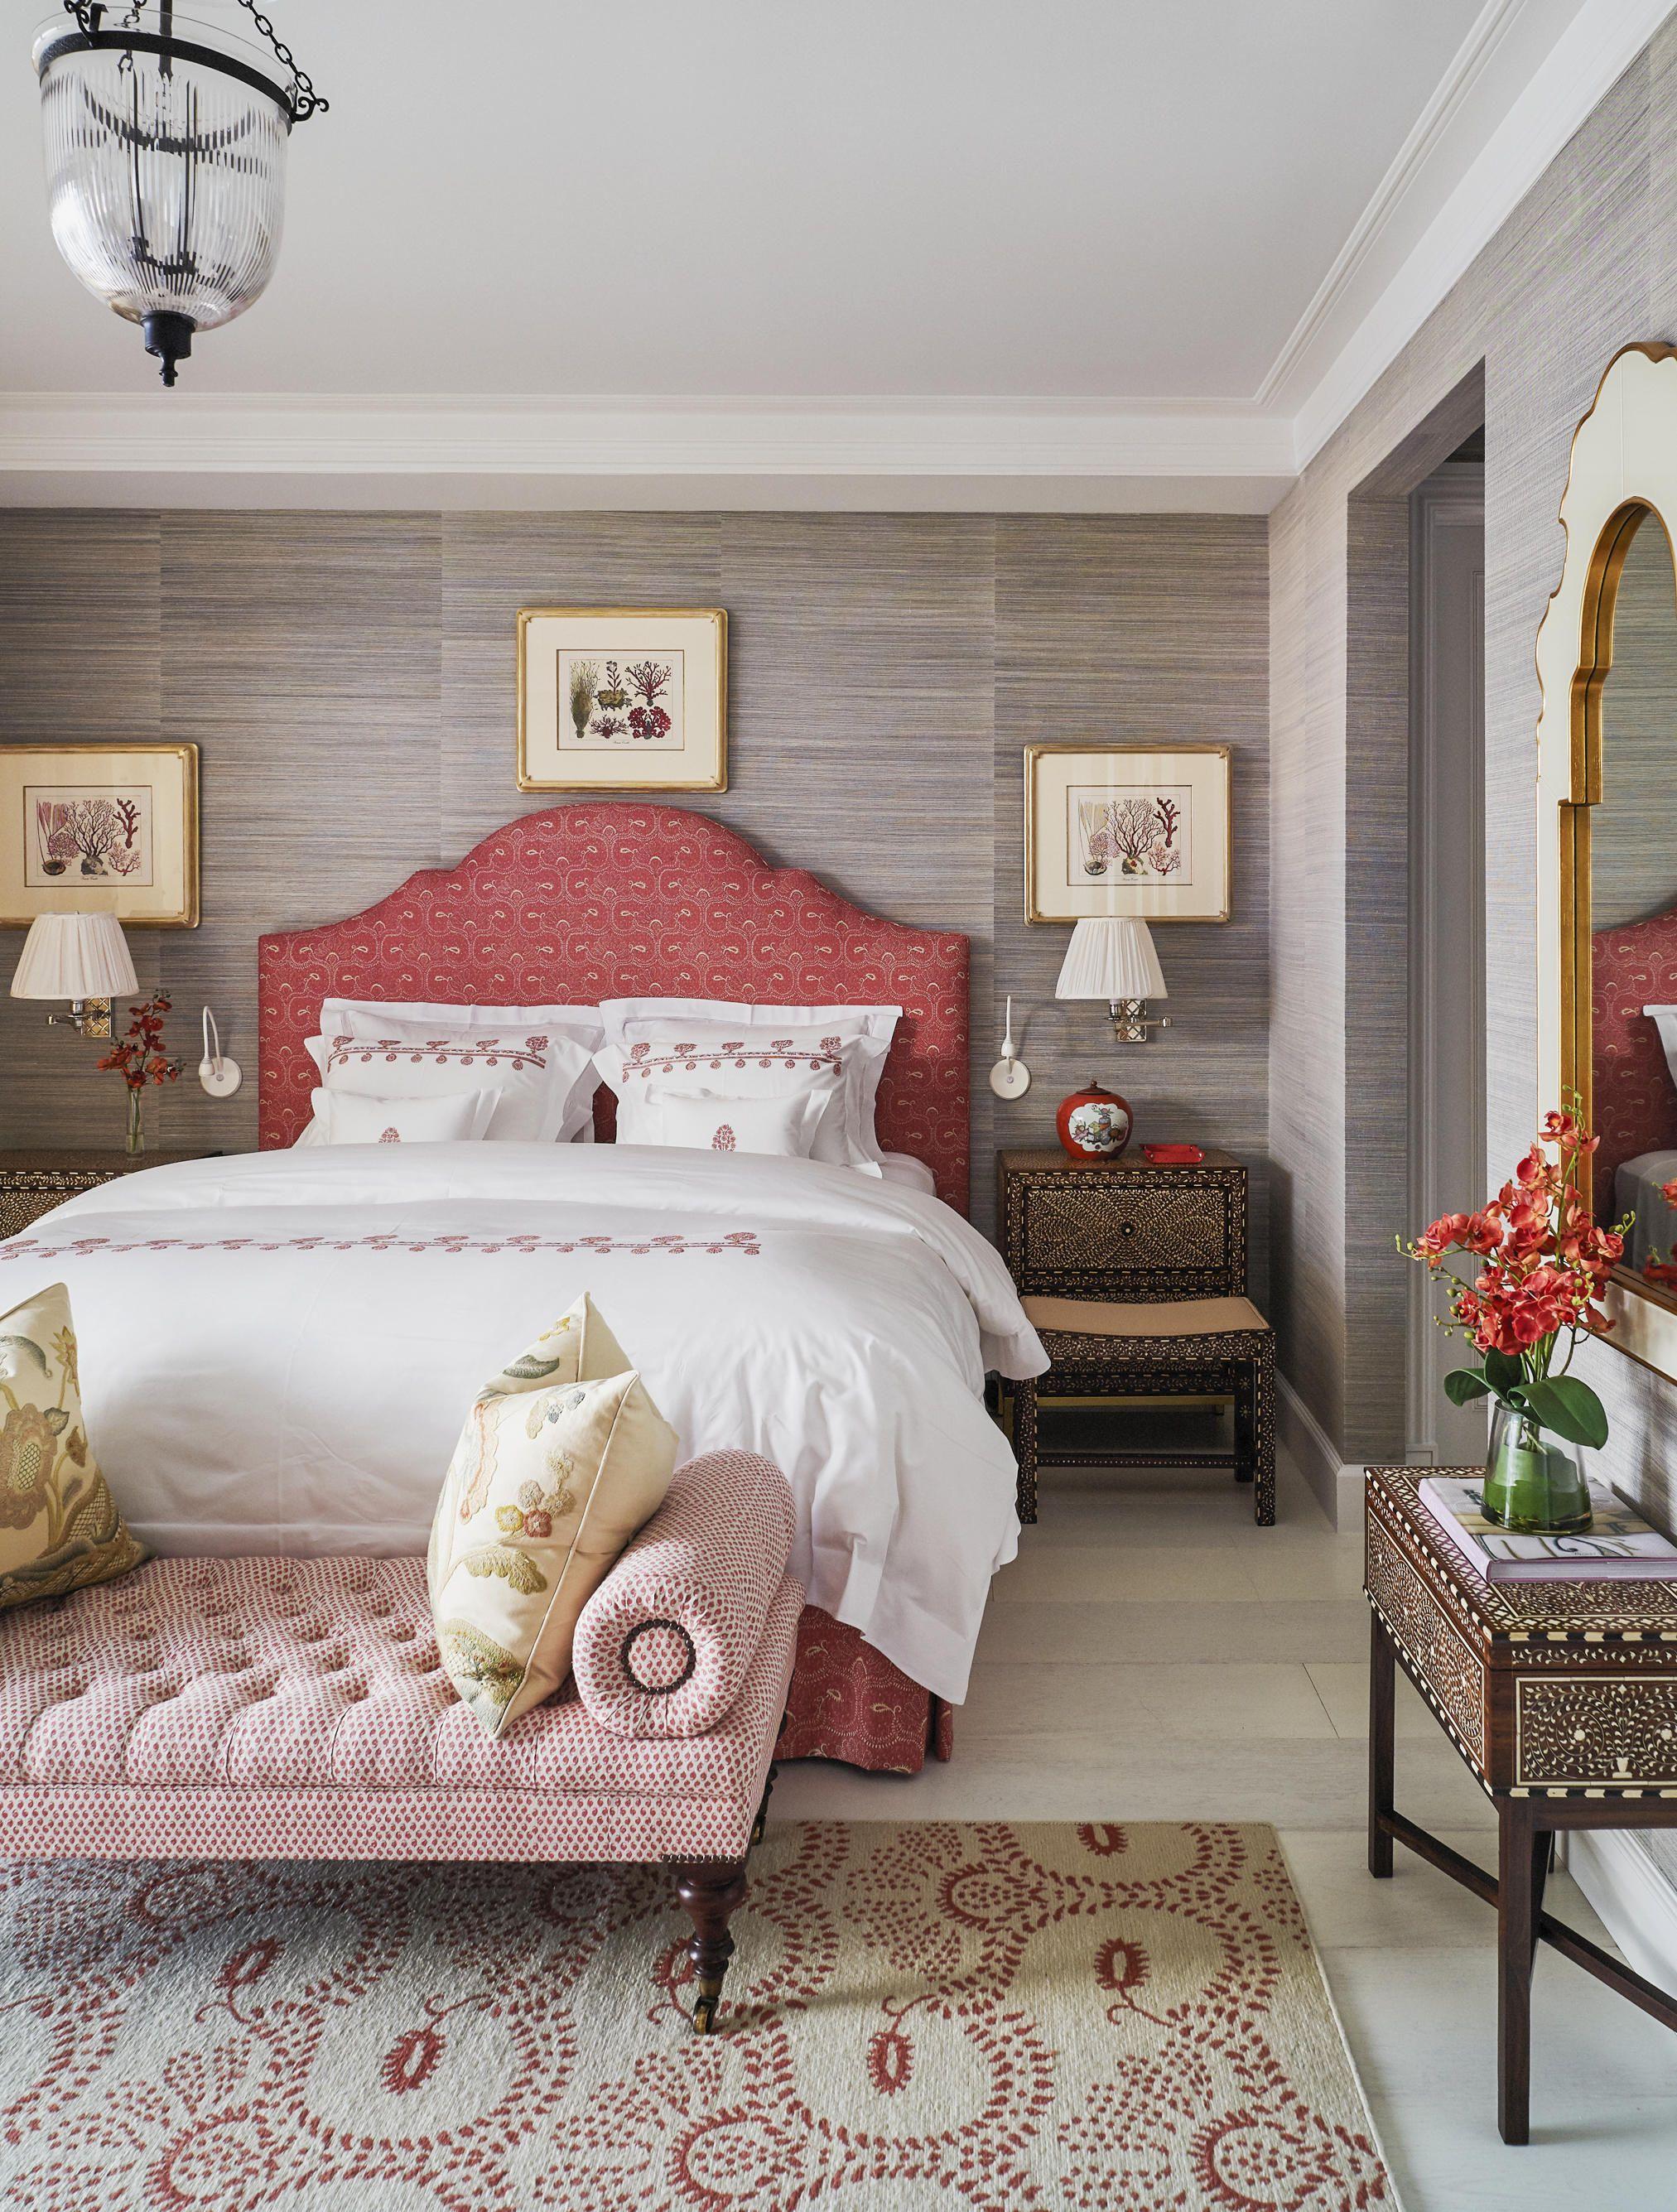 Coral bedroom ideas & 40 Best Bedroom Ideas - Beautiful Bedroom Decorating Tips